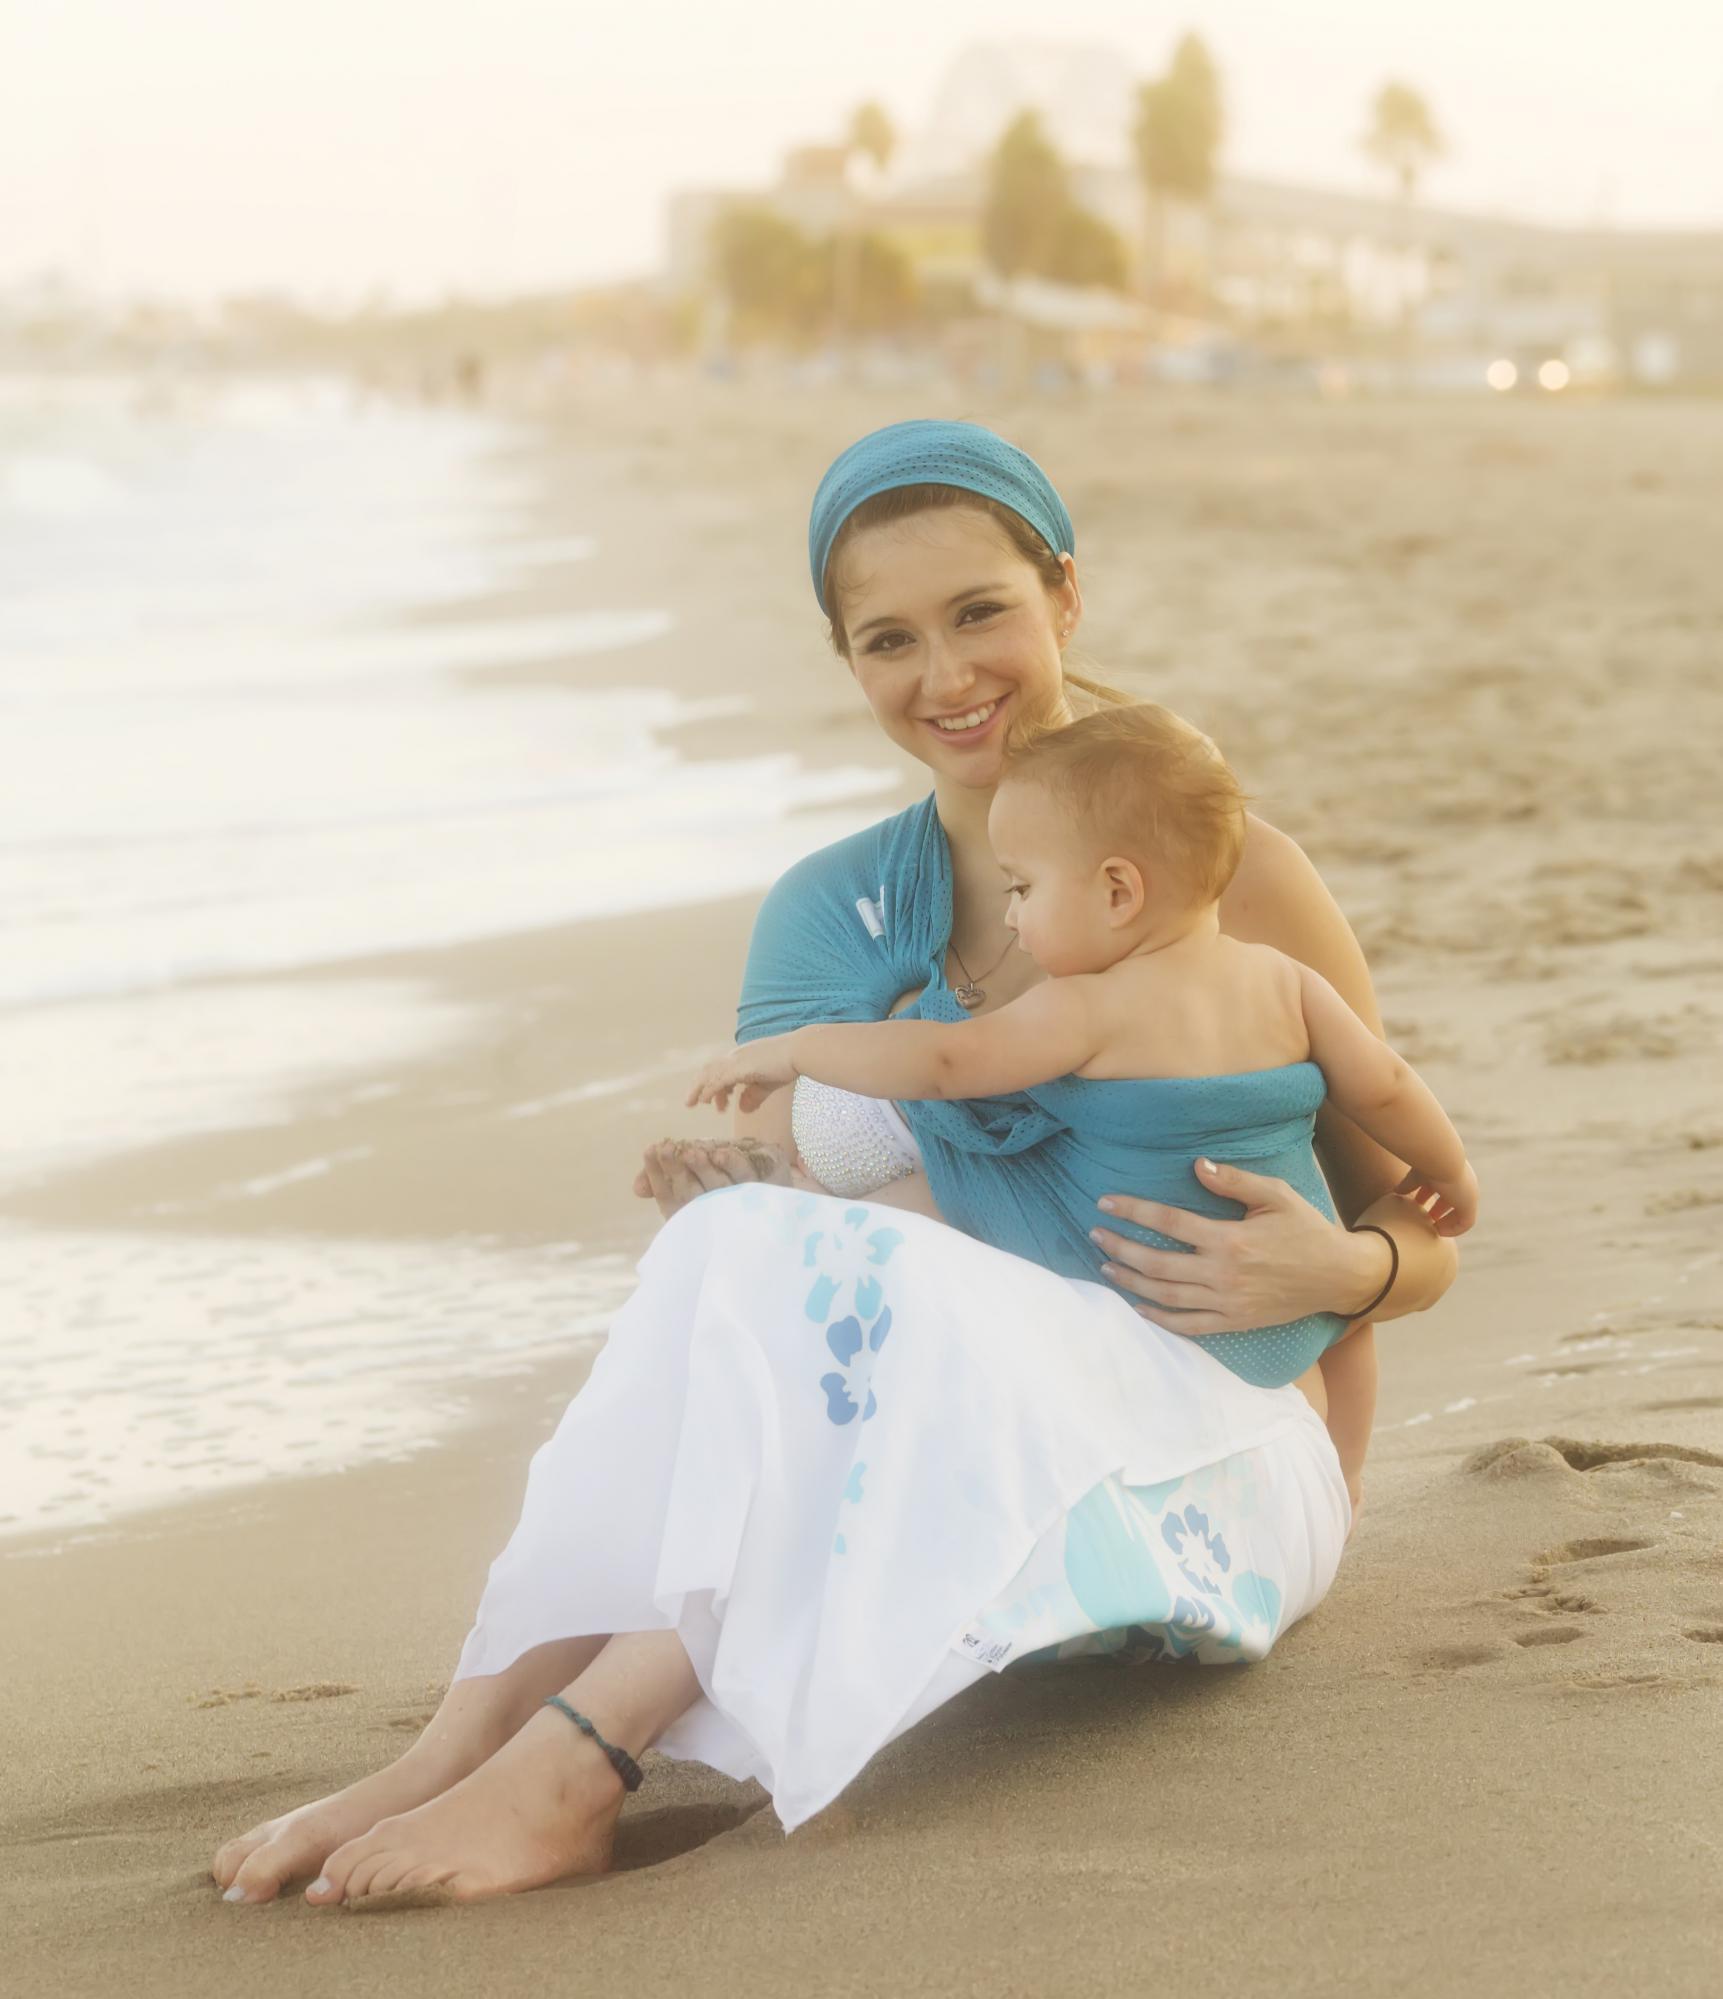 beachfront-baby-water-sling-caribbean-blue-3.jpg